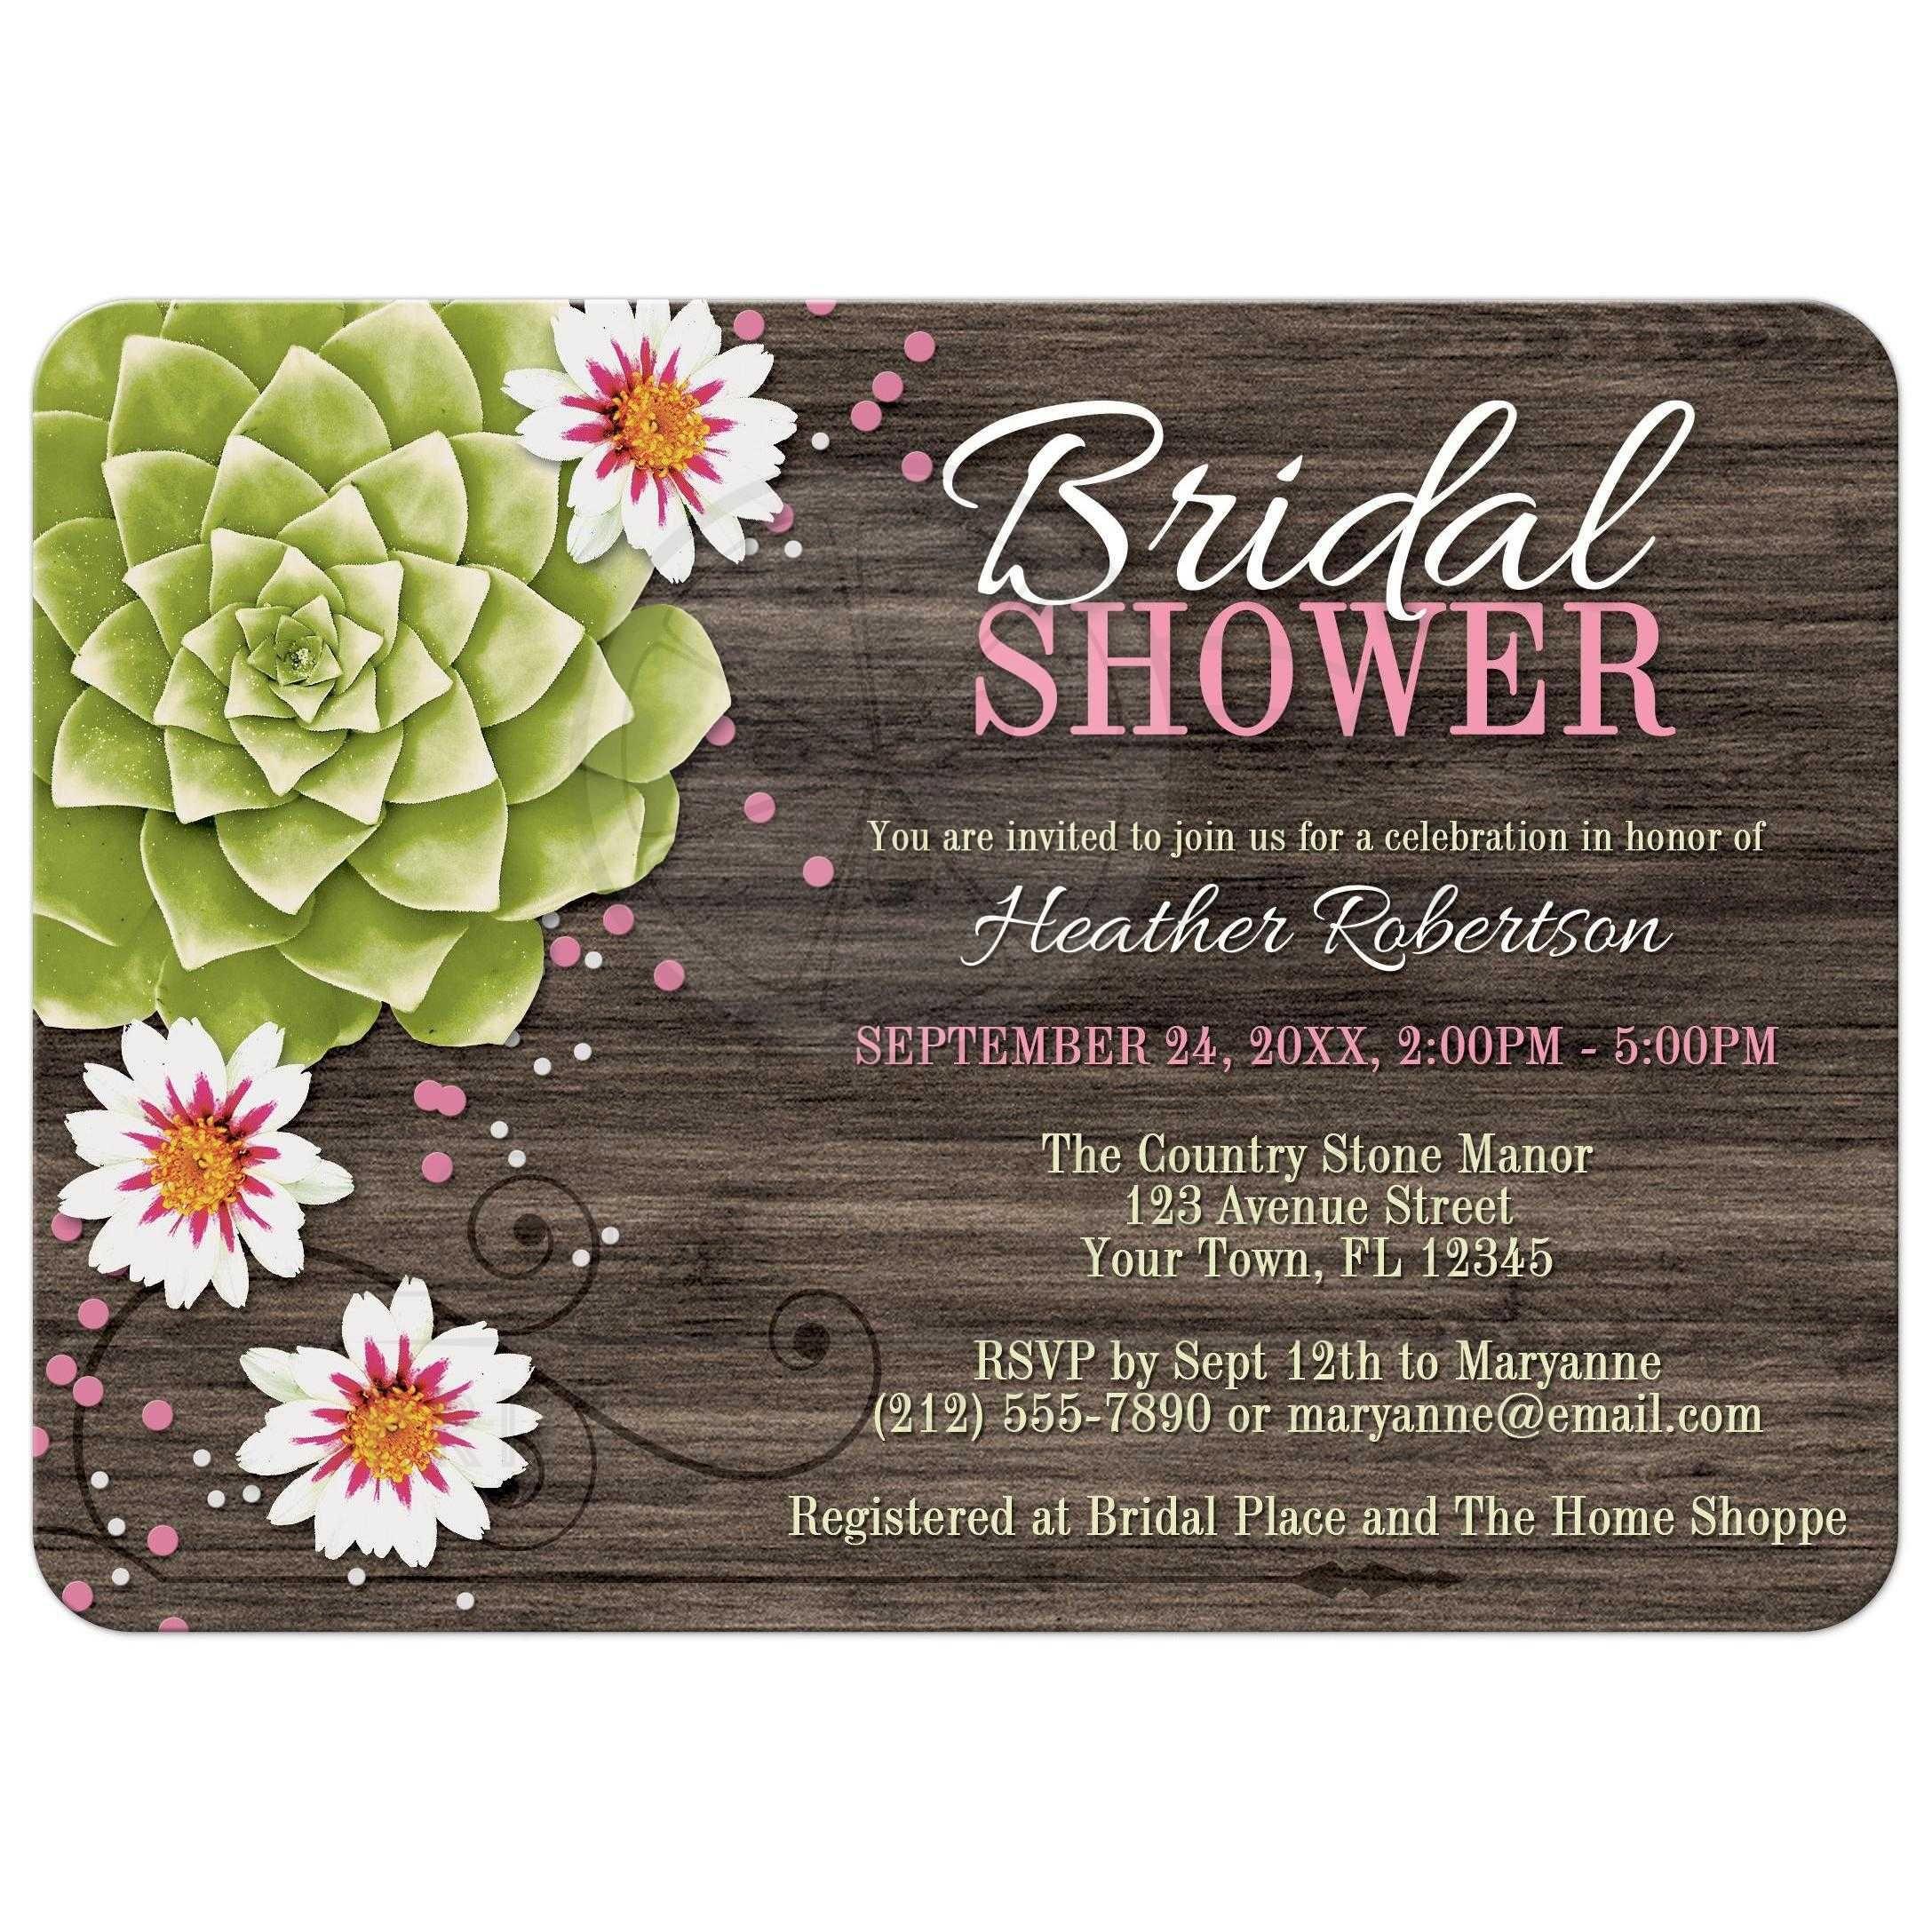 bridal shower invitation templates powerpoint wedding invitations walmart bridal shower invitations walmart